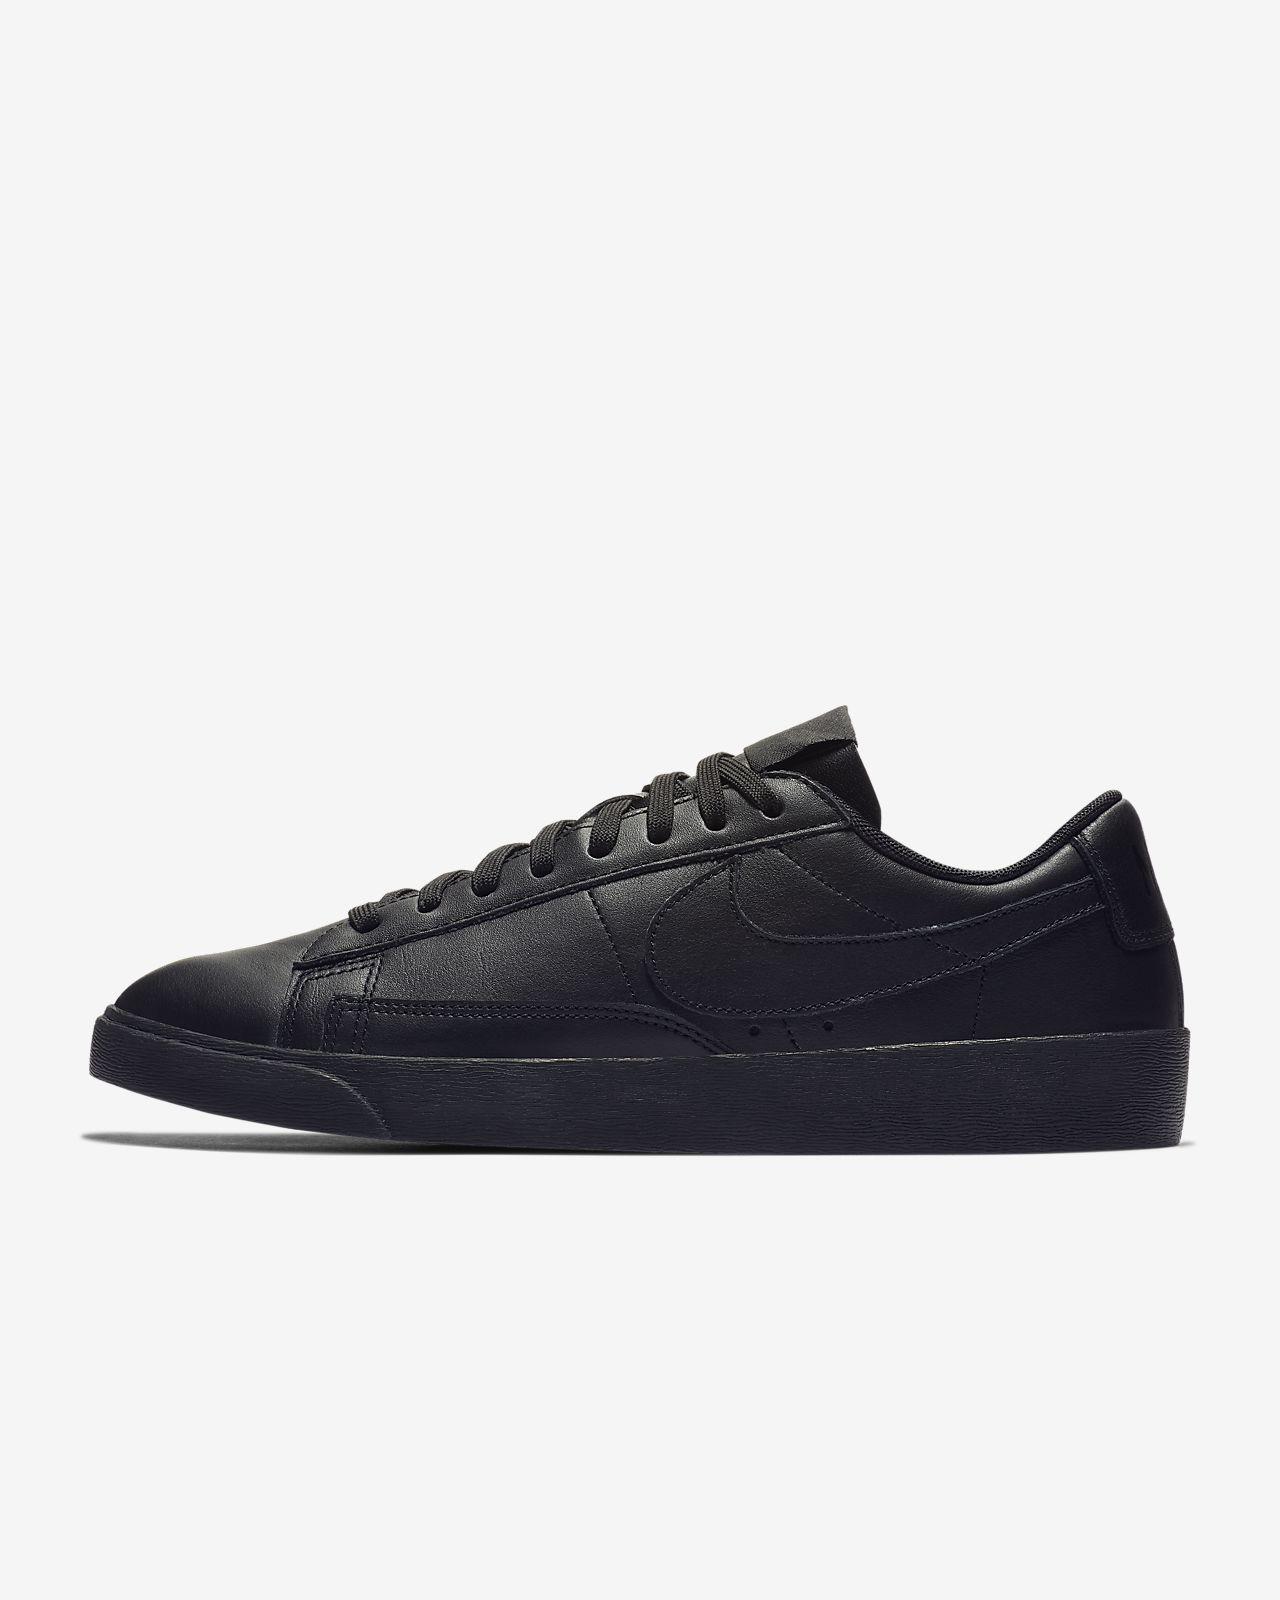 the latest 38d90 ae062 ... Nike Blazer Low LE-sko til kvinder